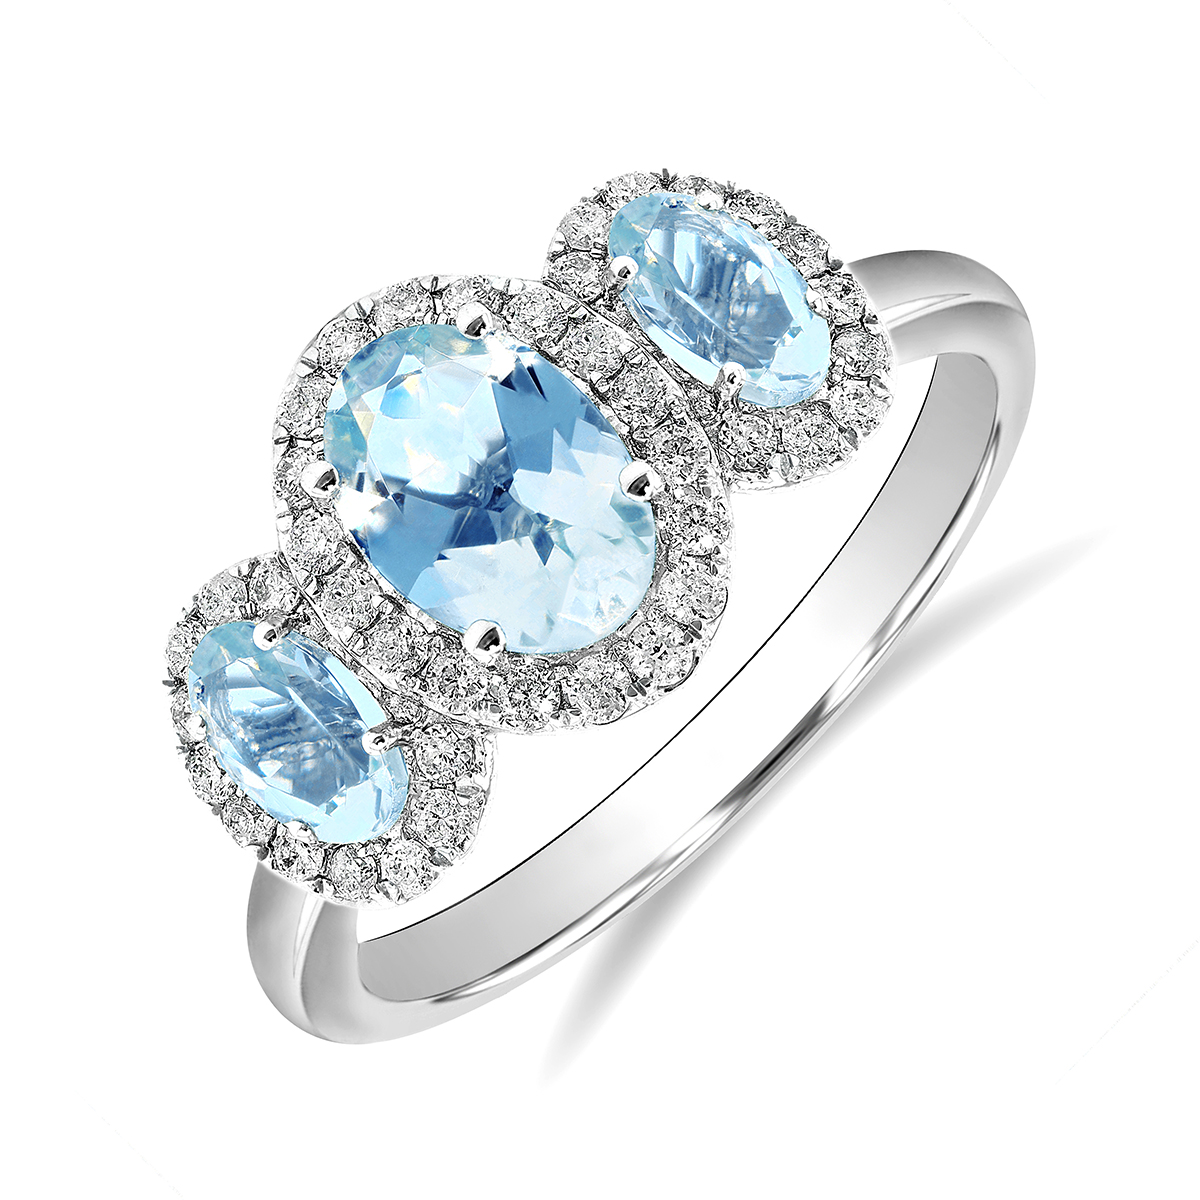 Rosa Mer Collection 1.13ct Aquamarine & Diamond Halo Ring